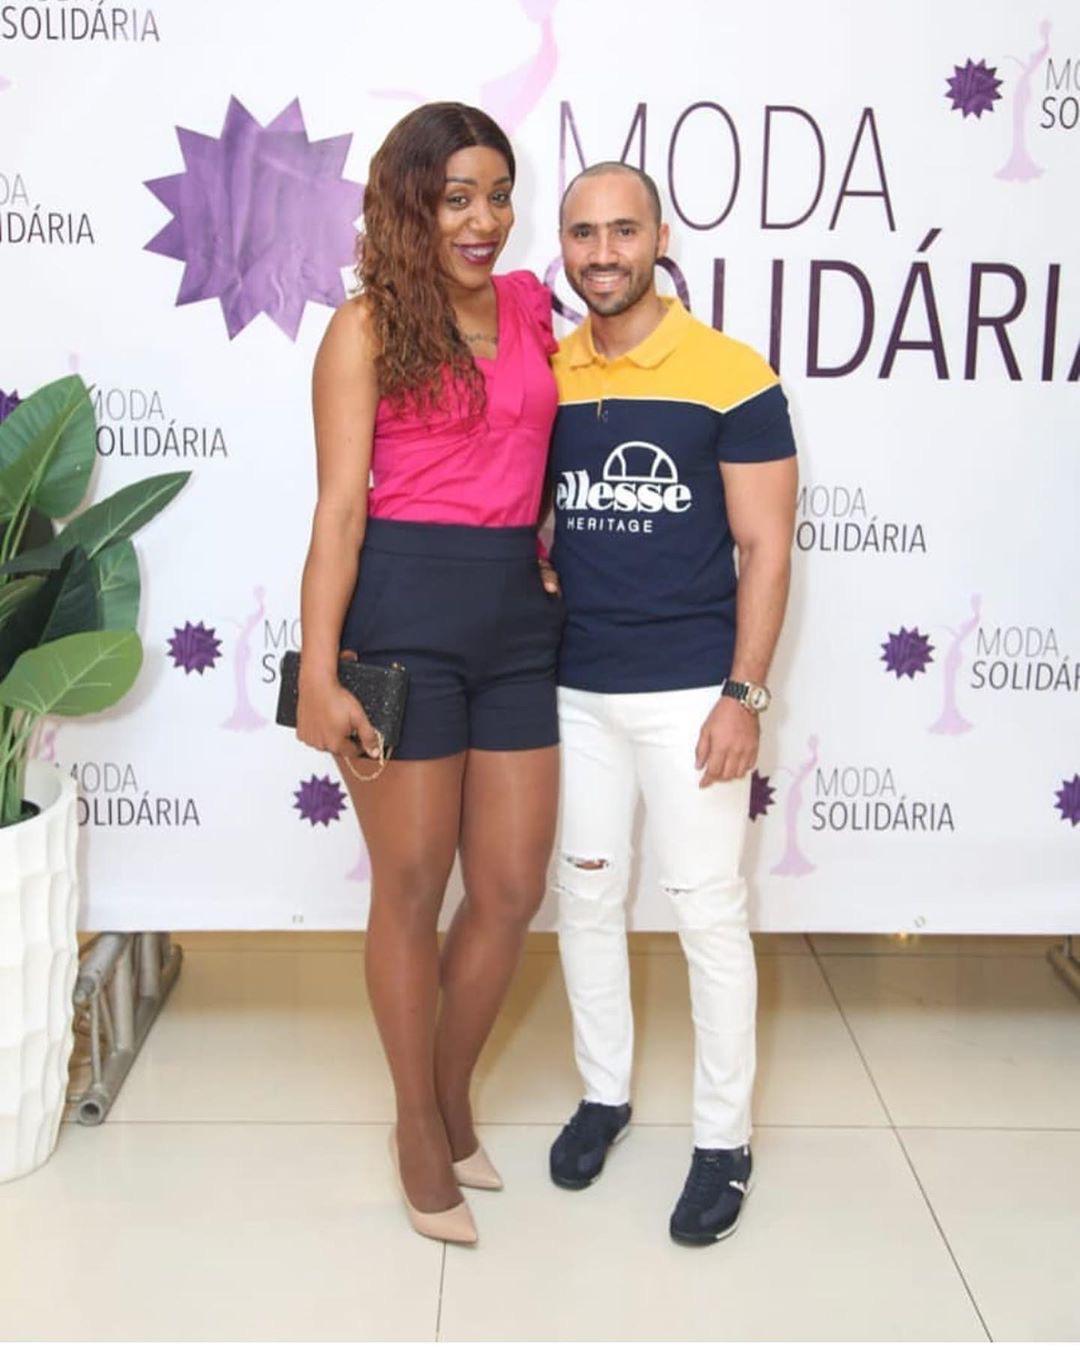 """Moda Solidária"" por Hadja Models"